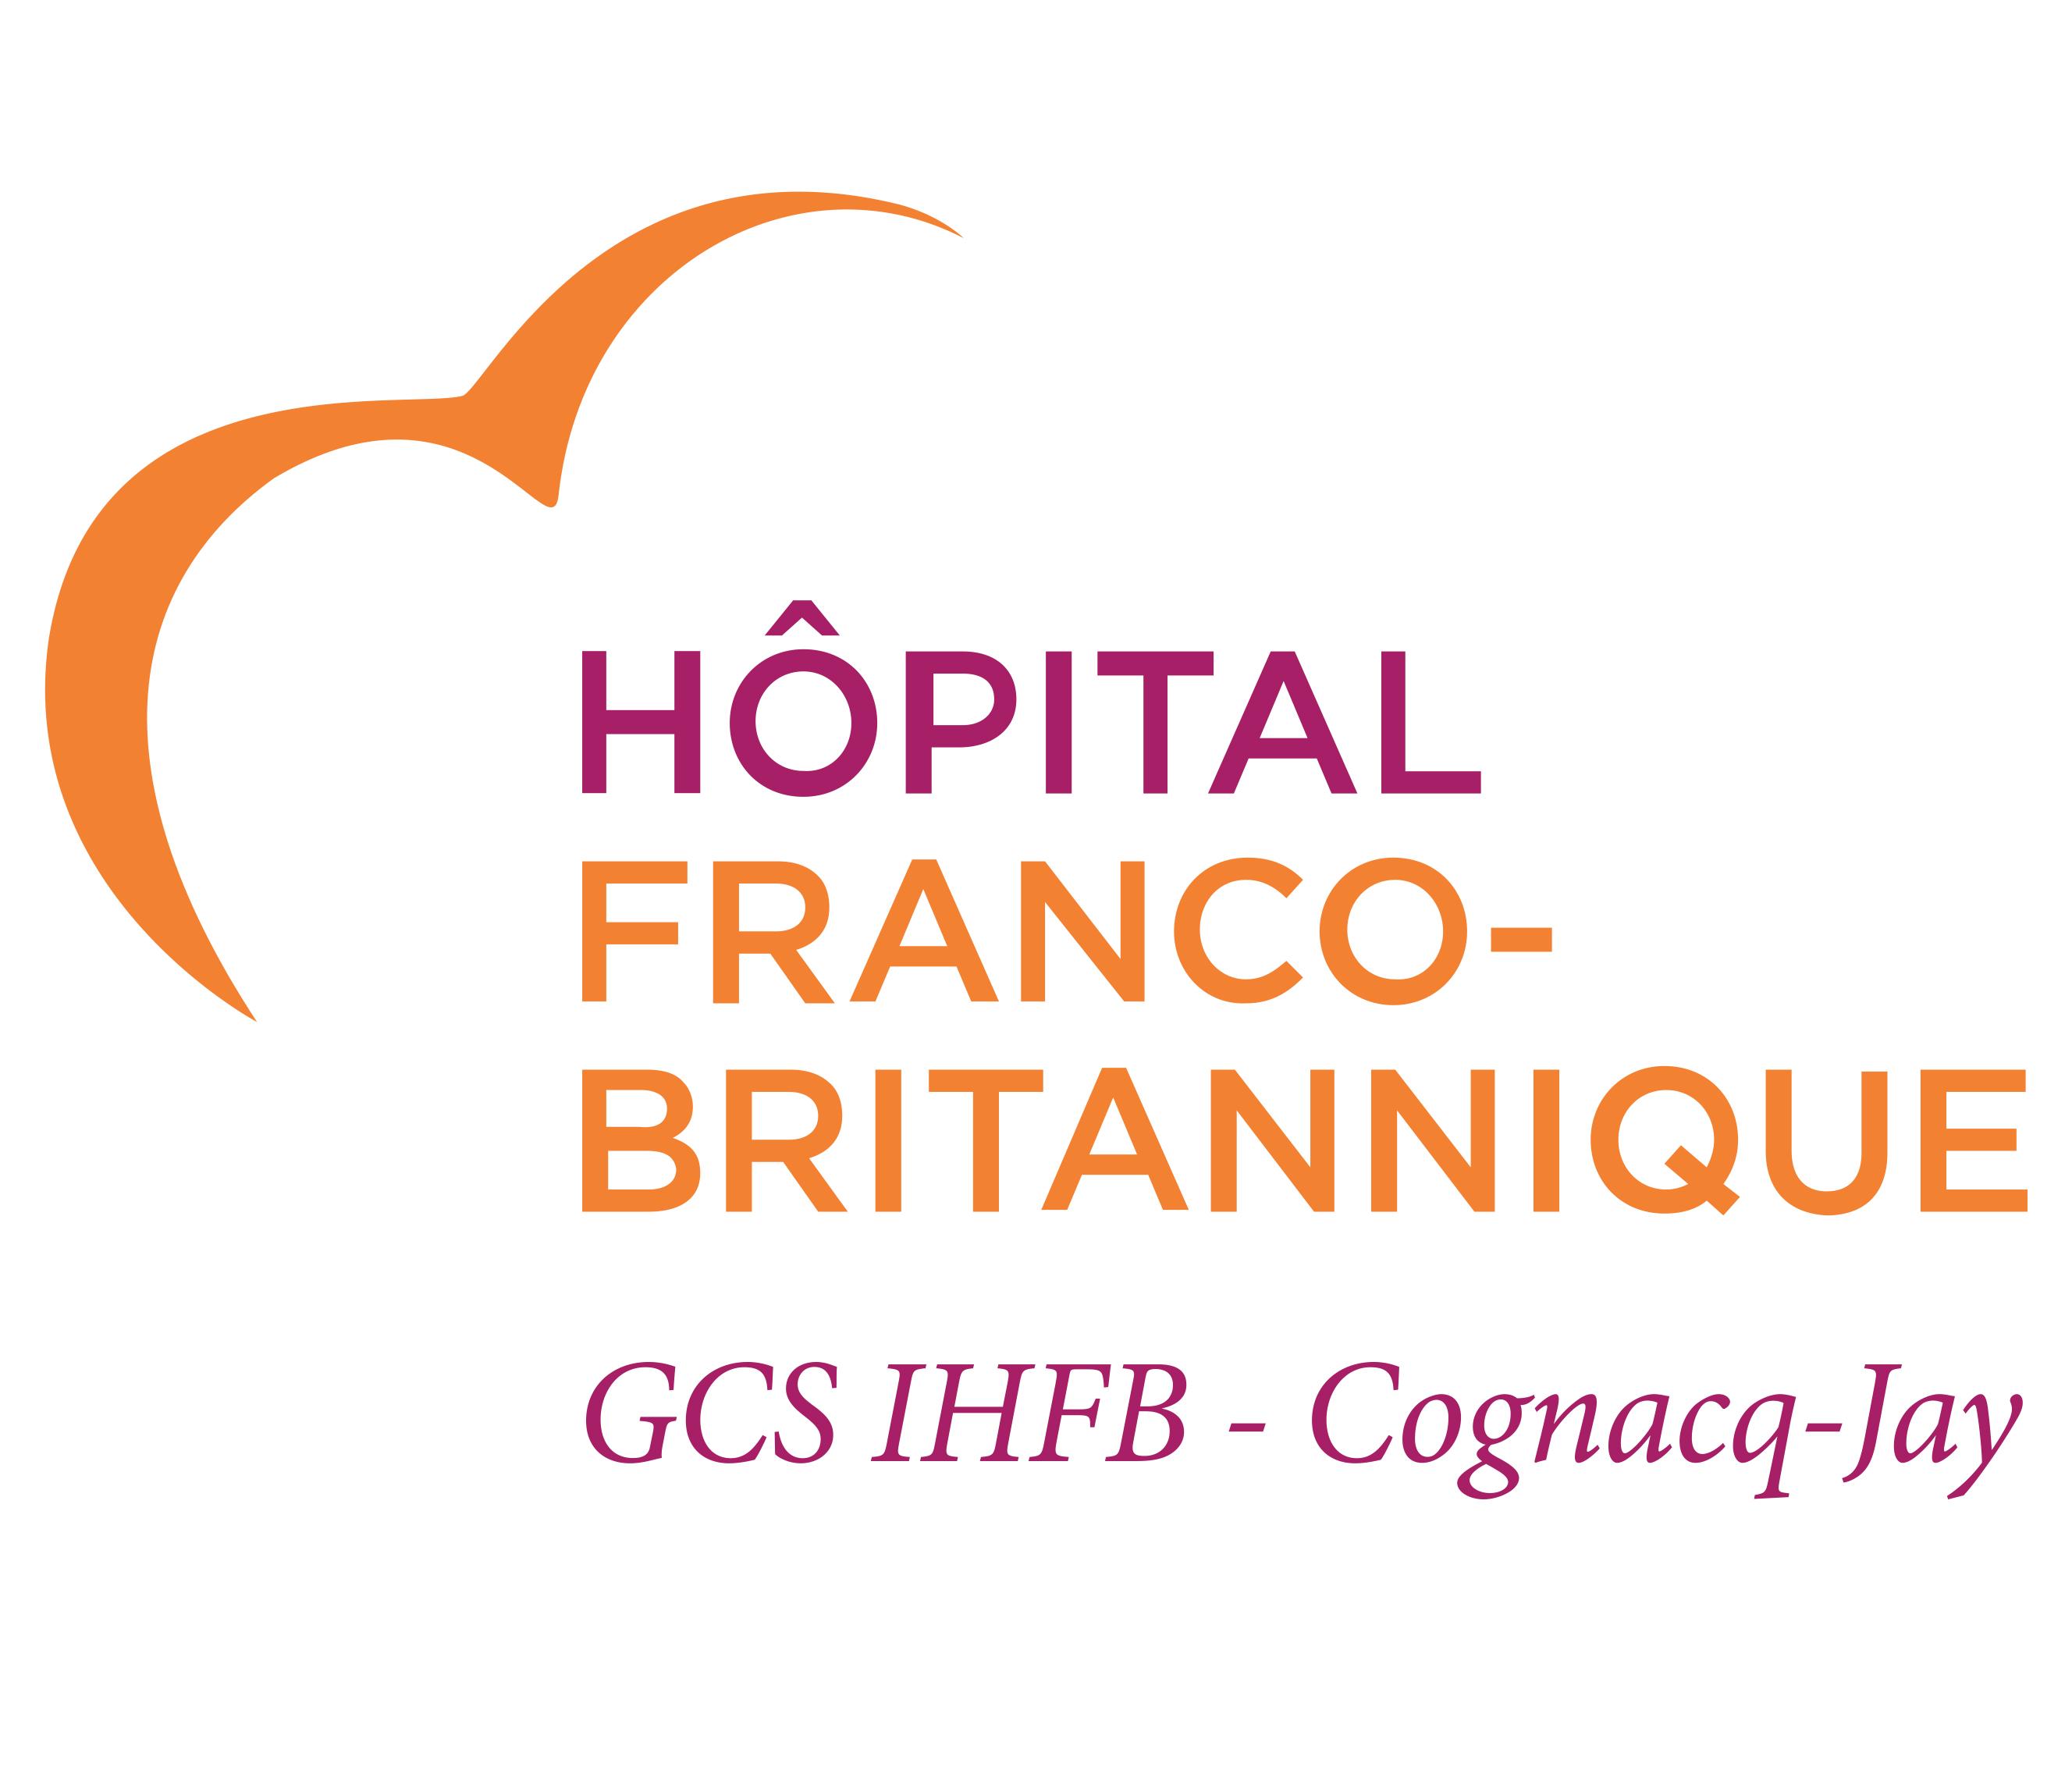 Hôpital Franco-britannique